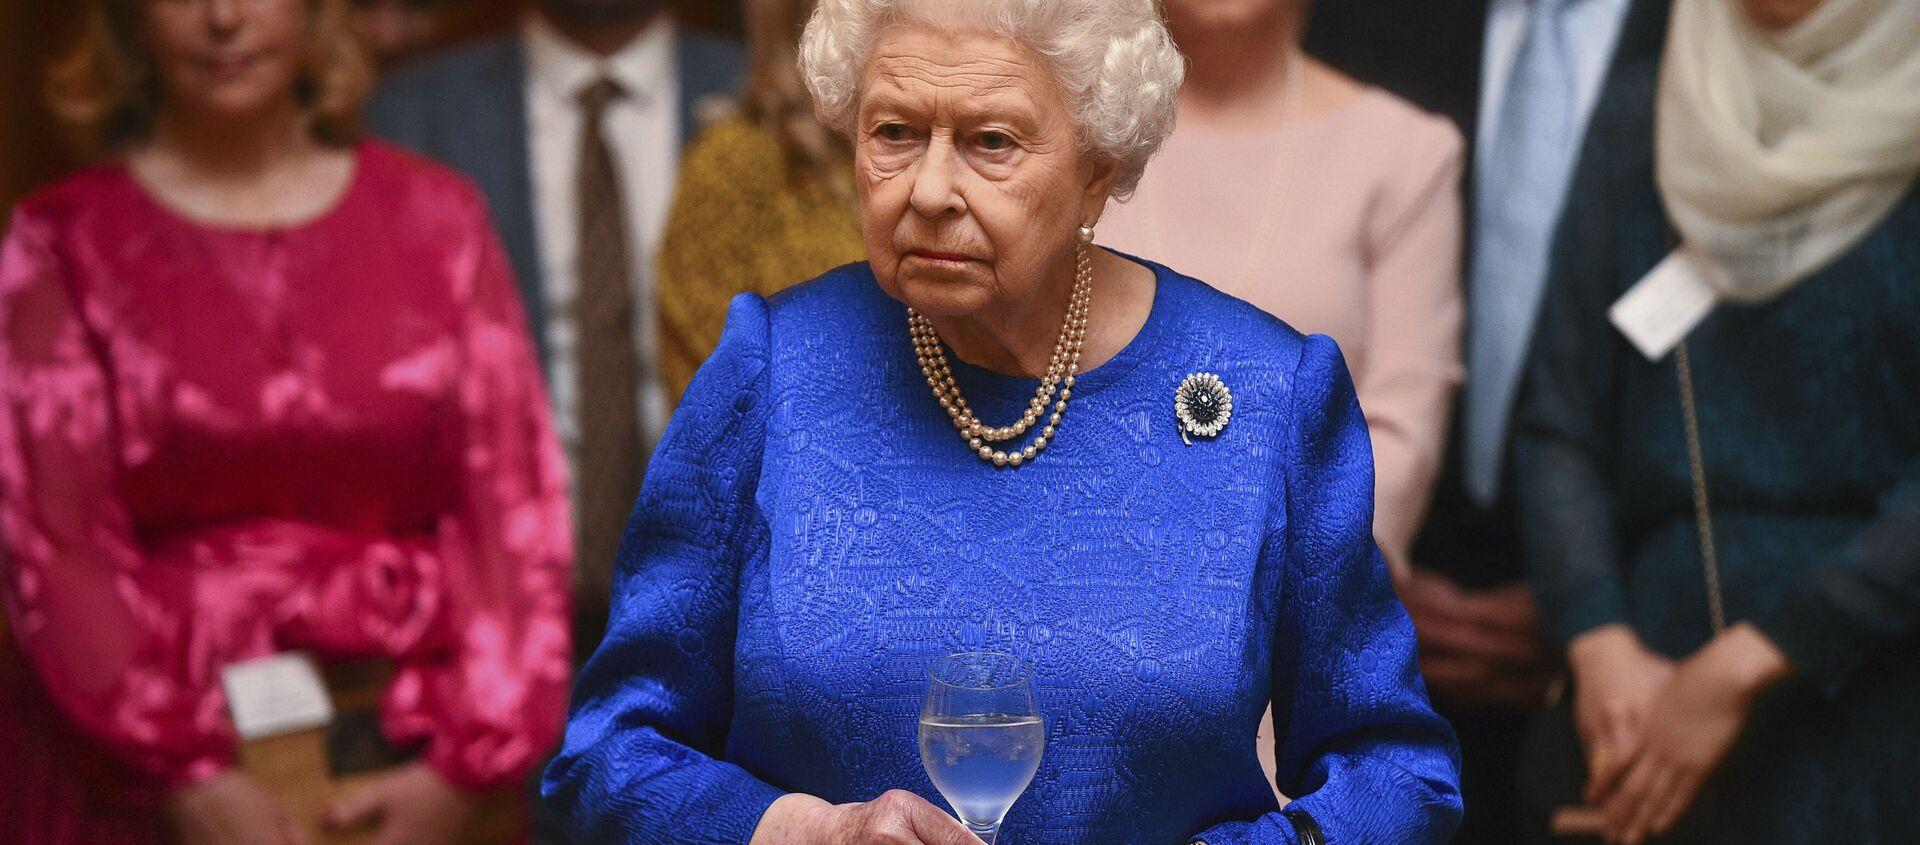 La reina Isabel II del Reino Unido - Sputnik Mundo, 1920, 09.01.2021